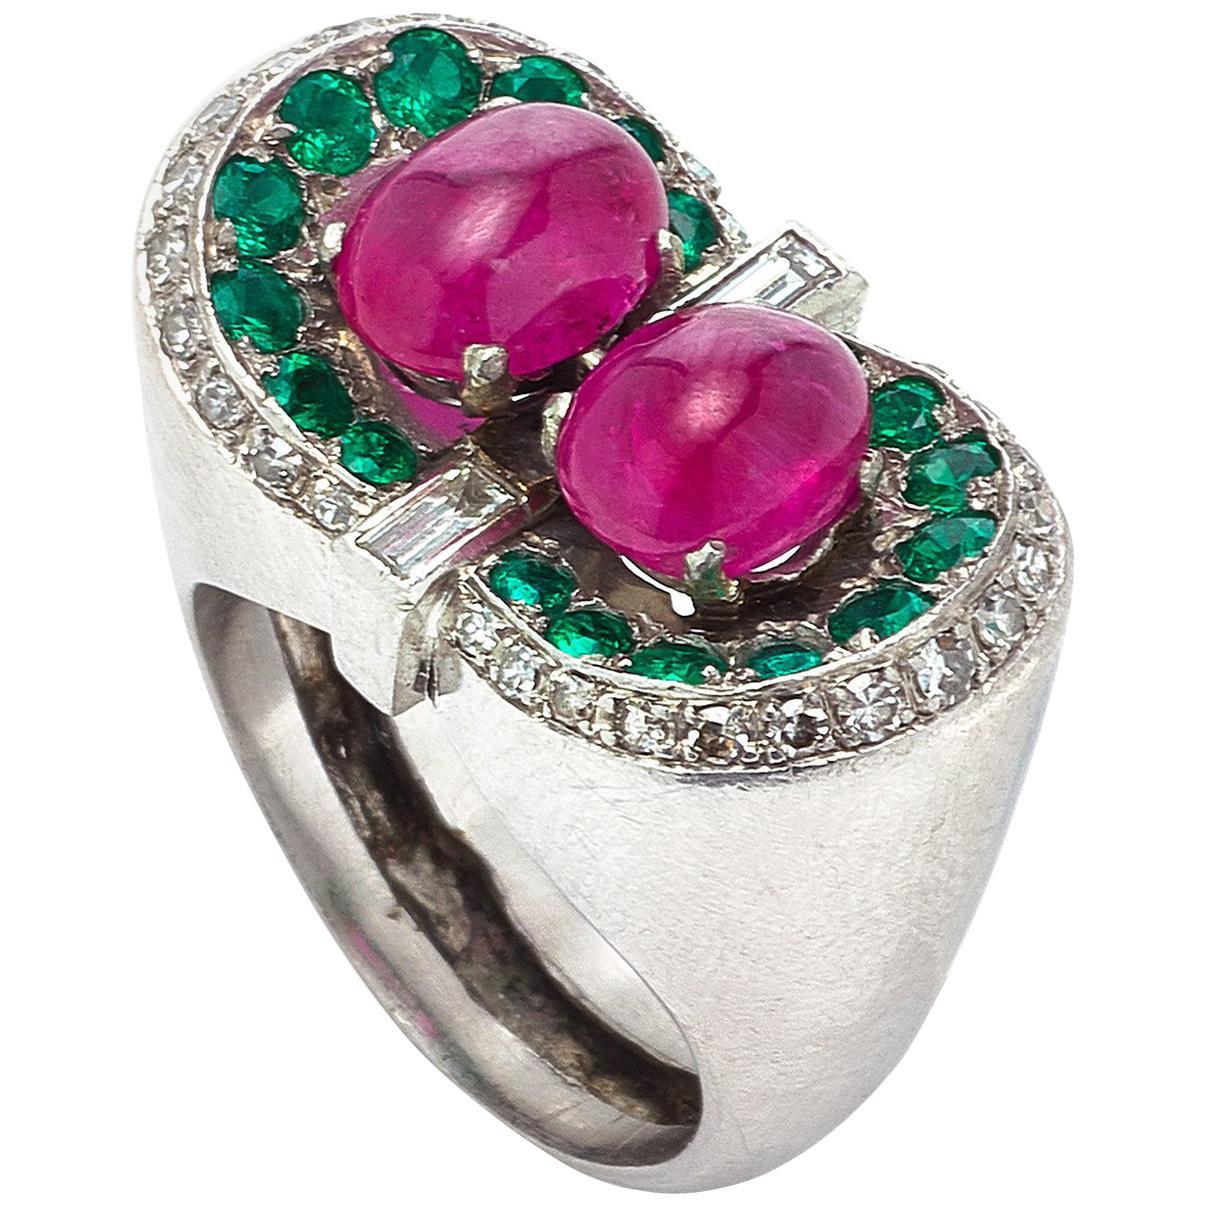 Cabochon Ruby Emerald Emeralds Diamond Ring